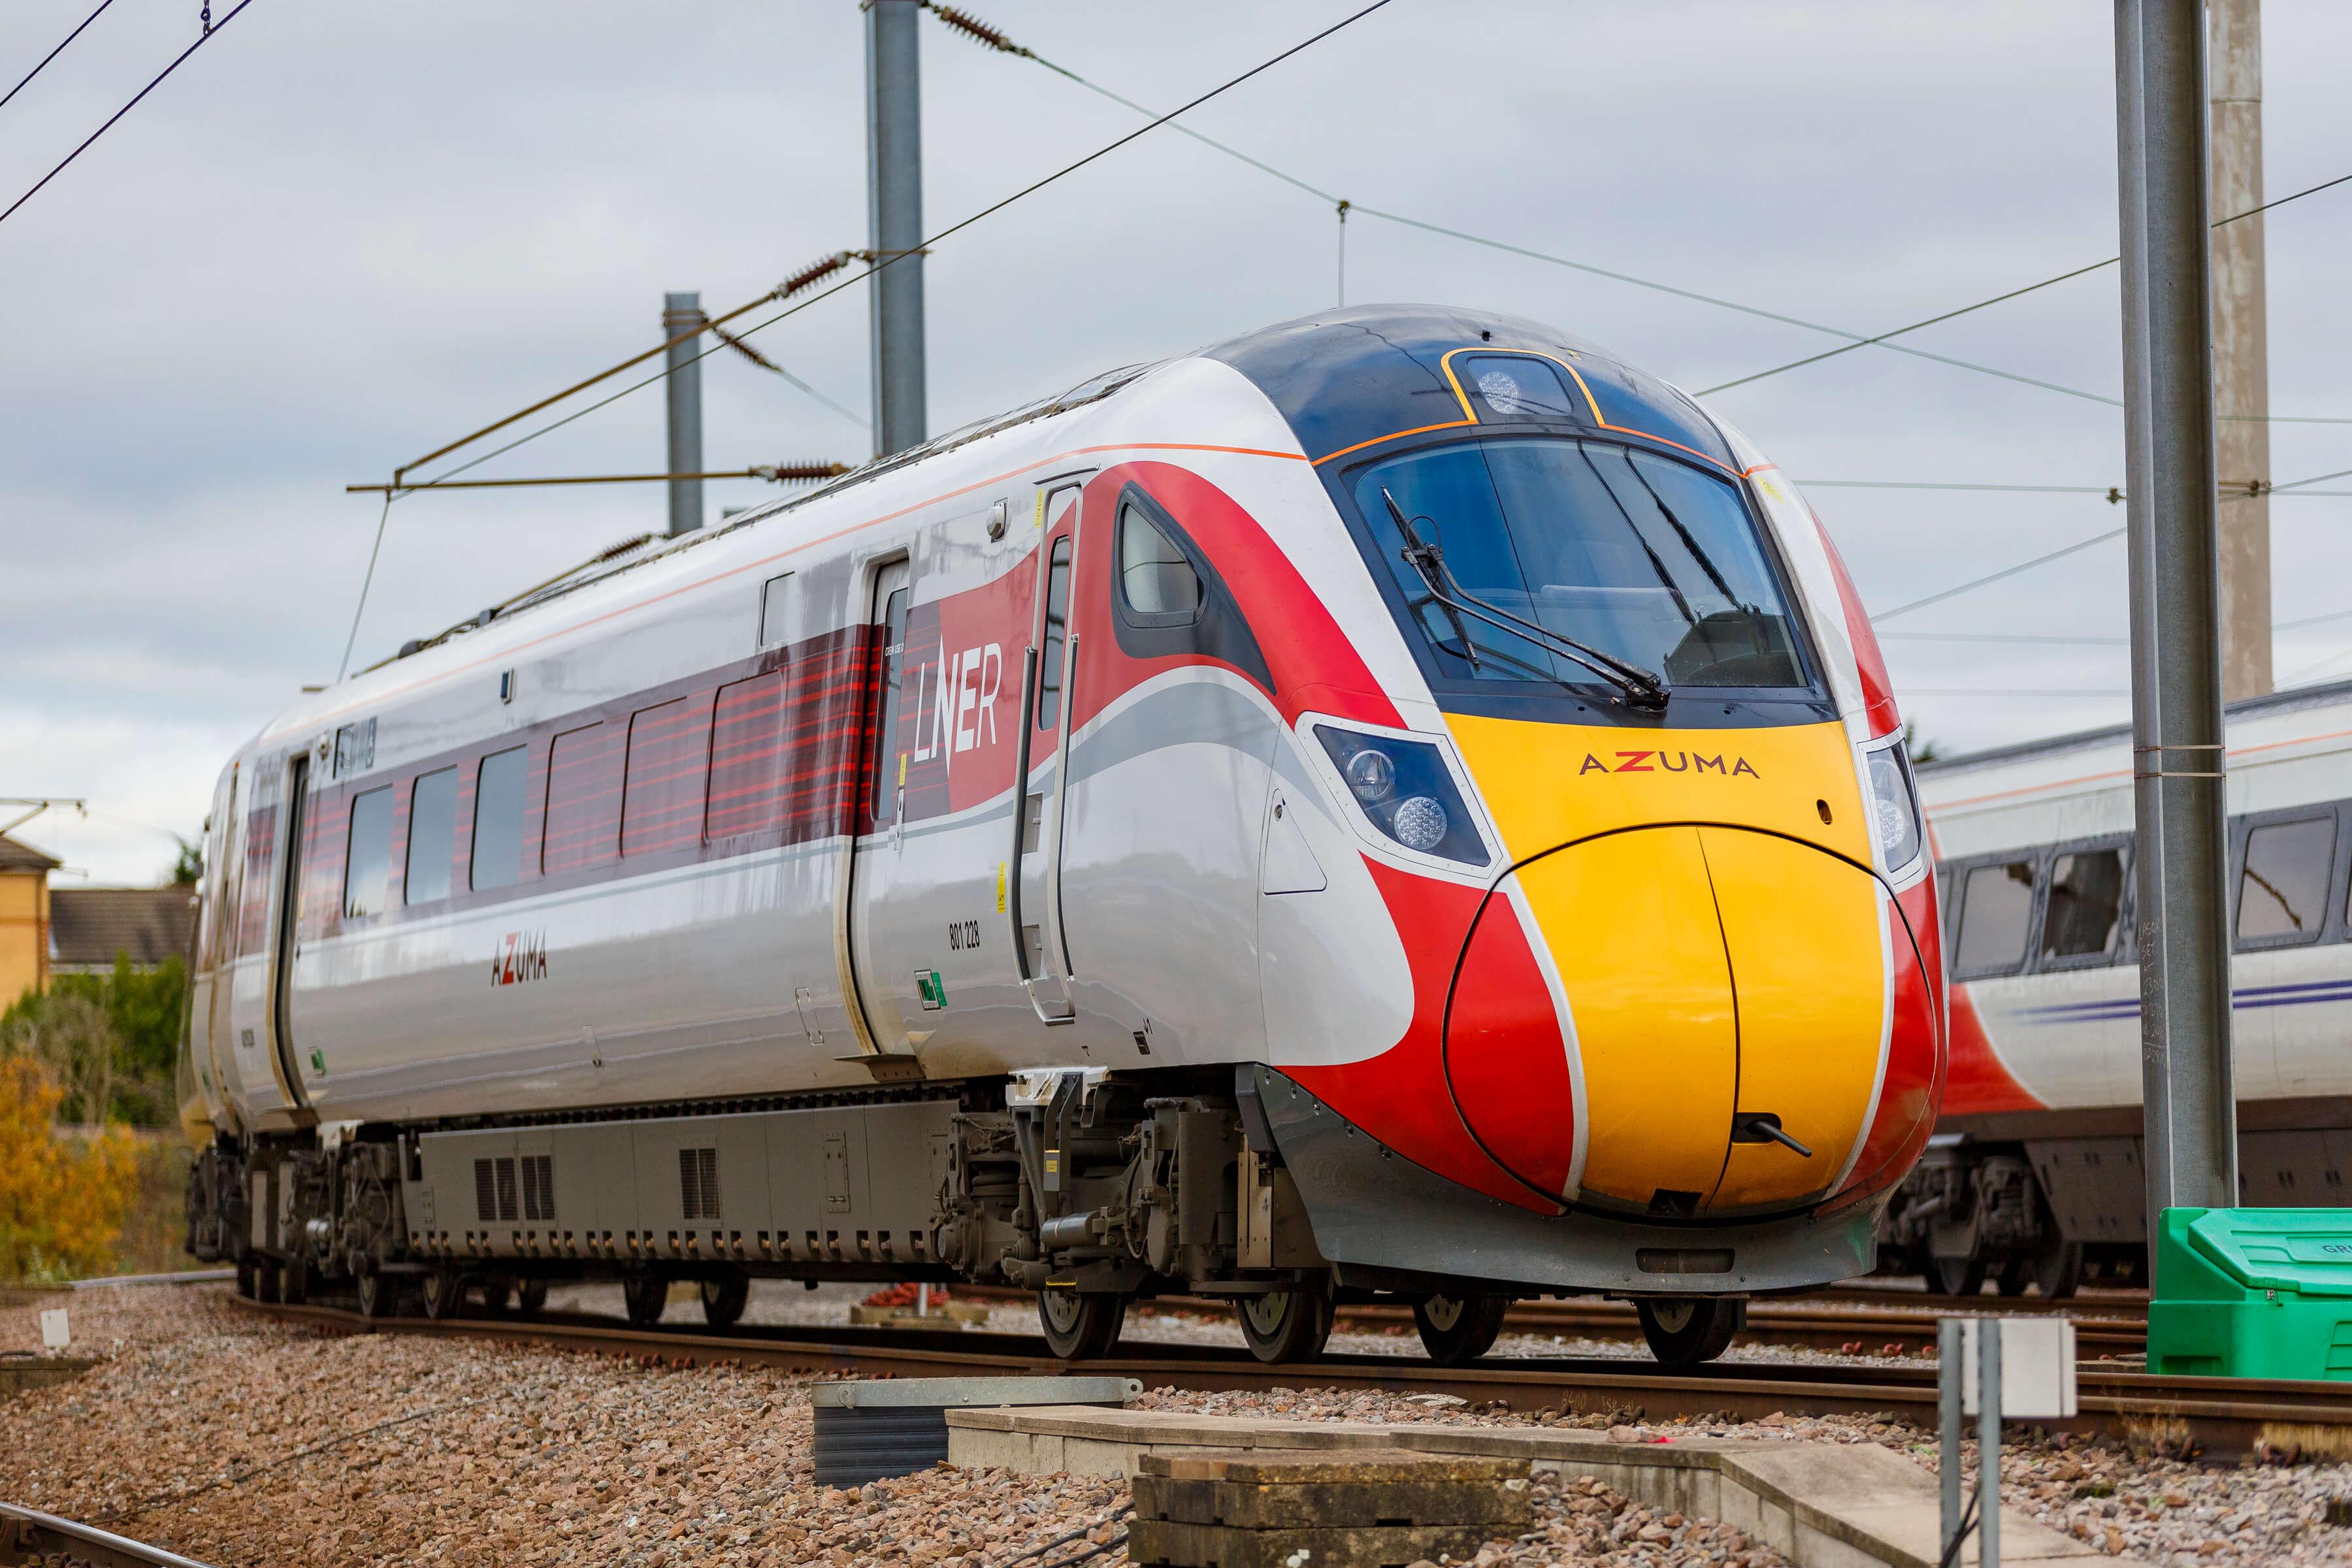 LNER train